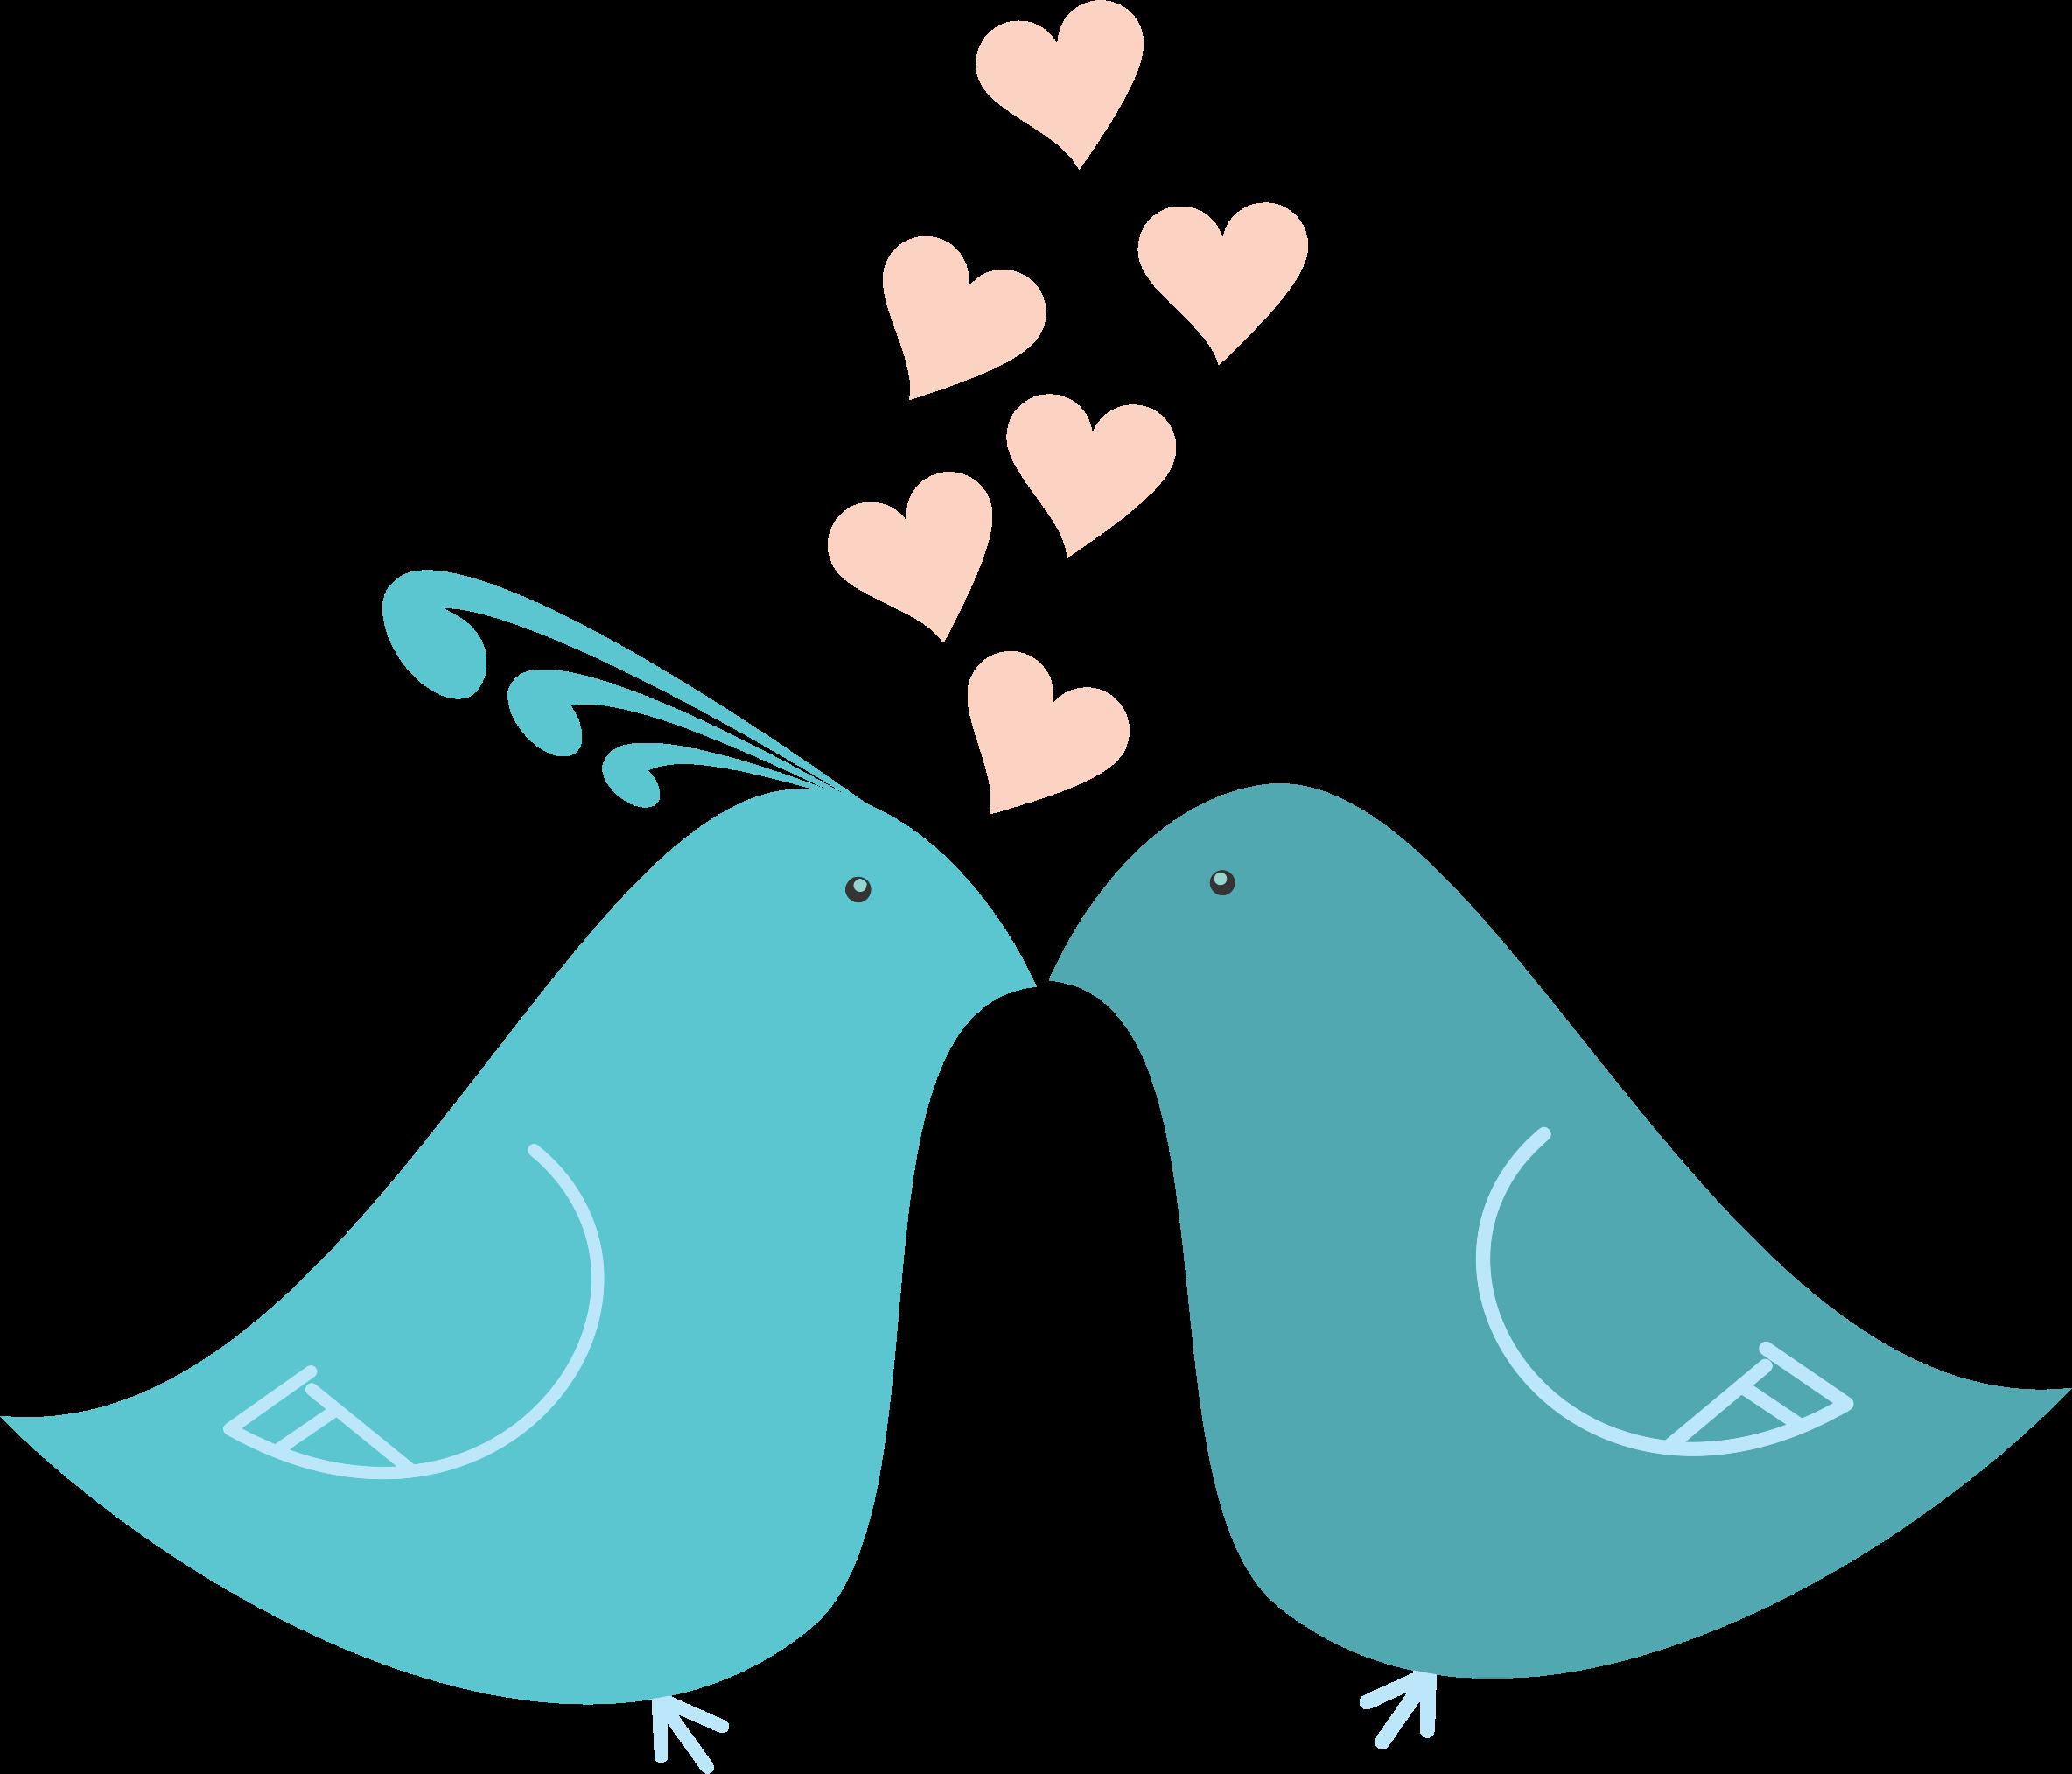 2368x2027 Love Birds Png Transparent Love Birds.png Images. Pluspng